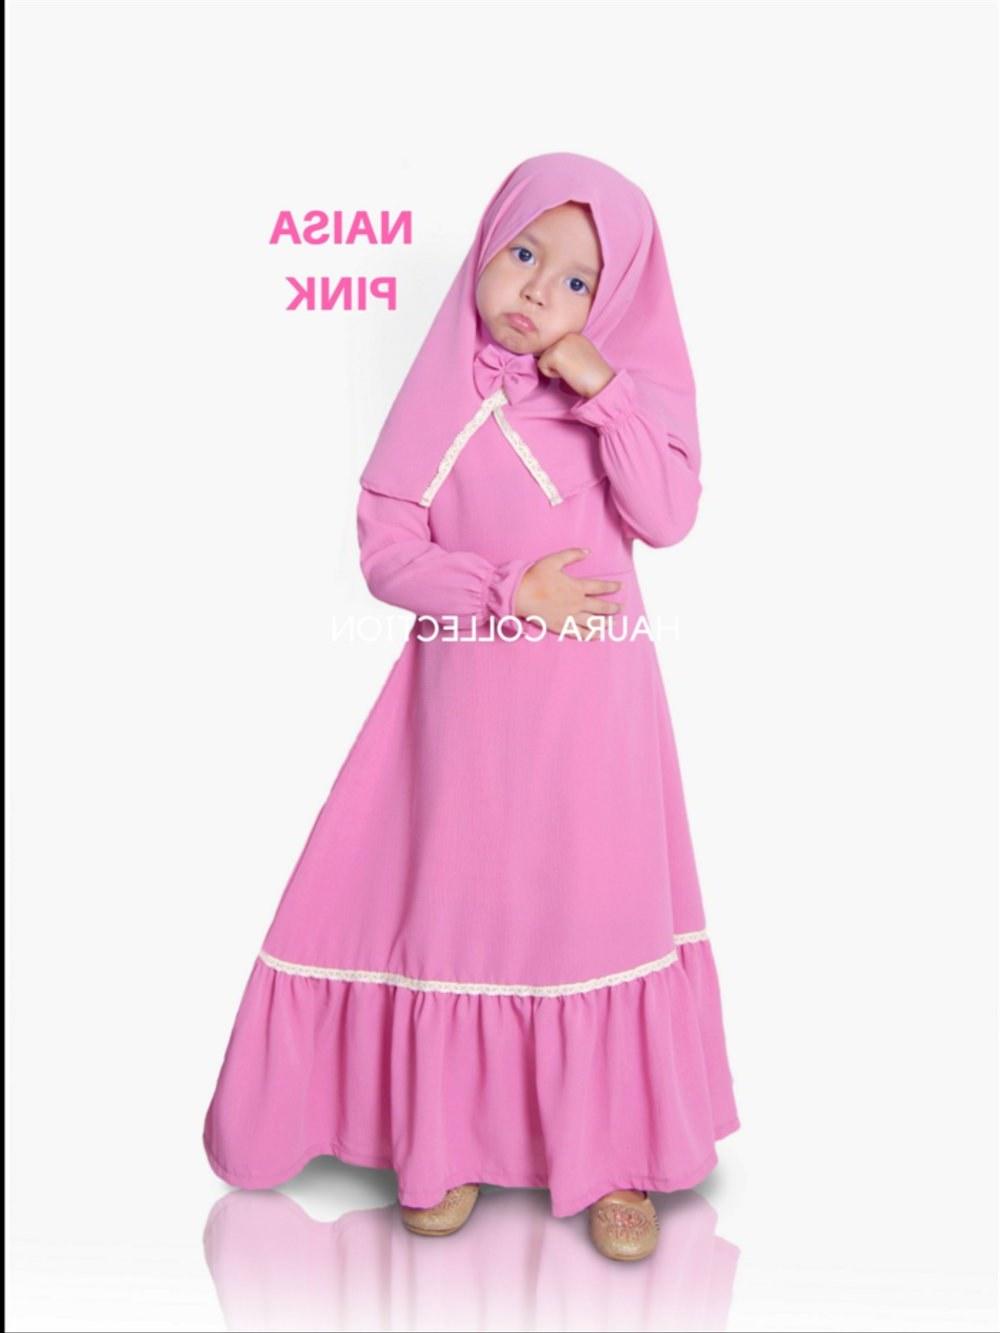 Inspirasi Jual Baju Pengantin Muslimah Zwd9 Bayi